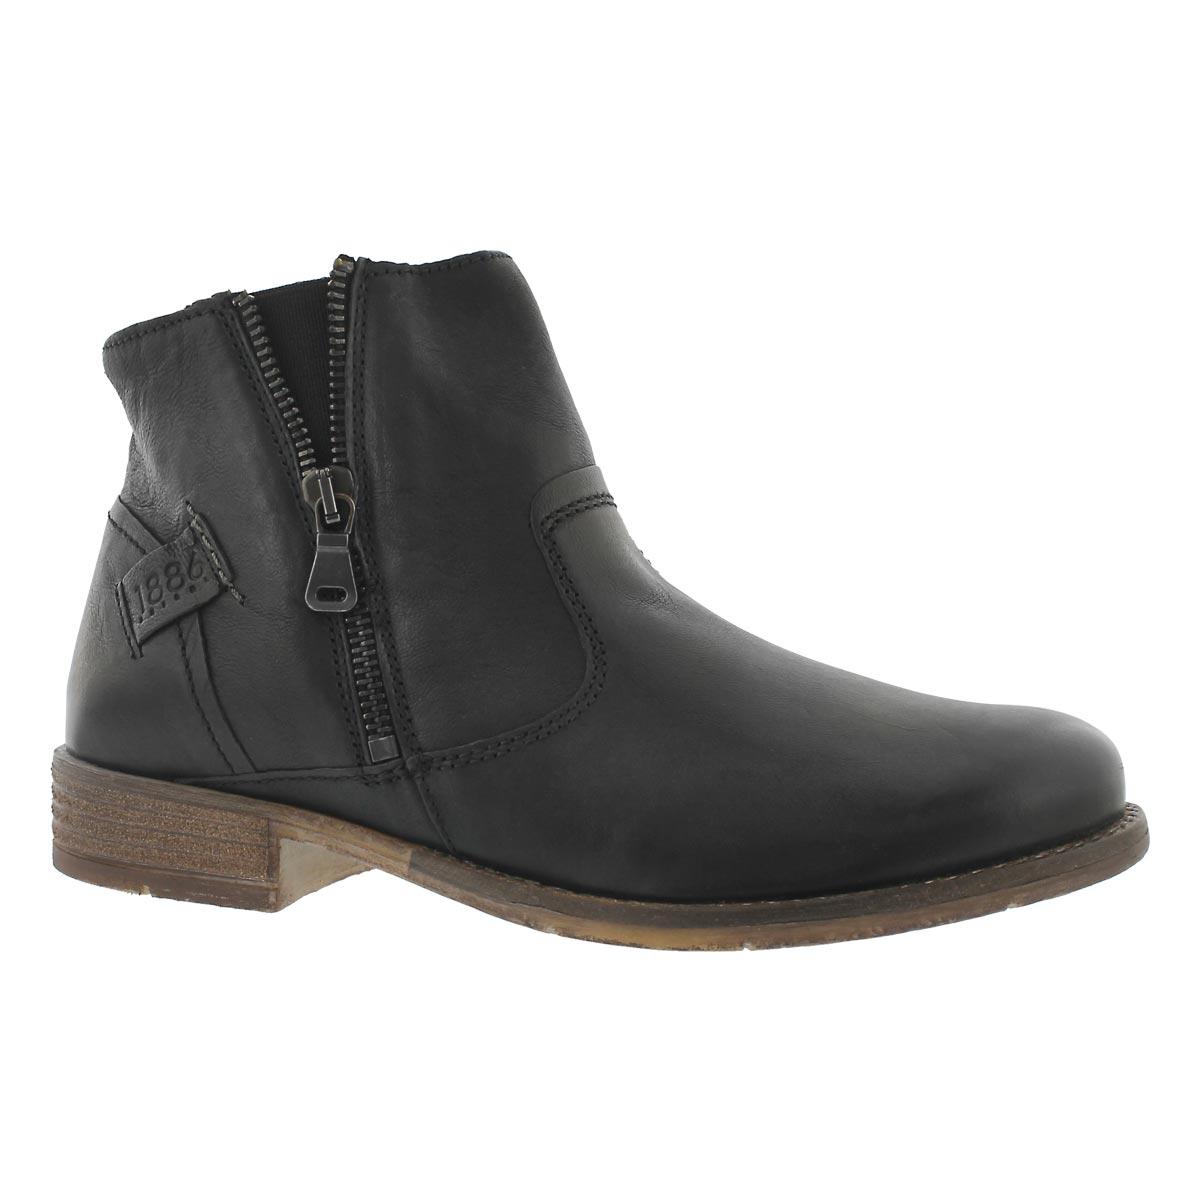 Women's SIENNA 49 schwarz side zip ankle boots